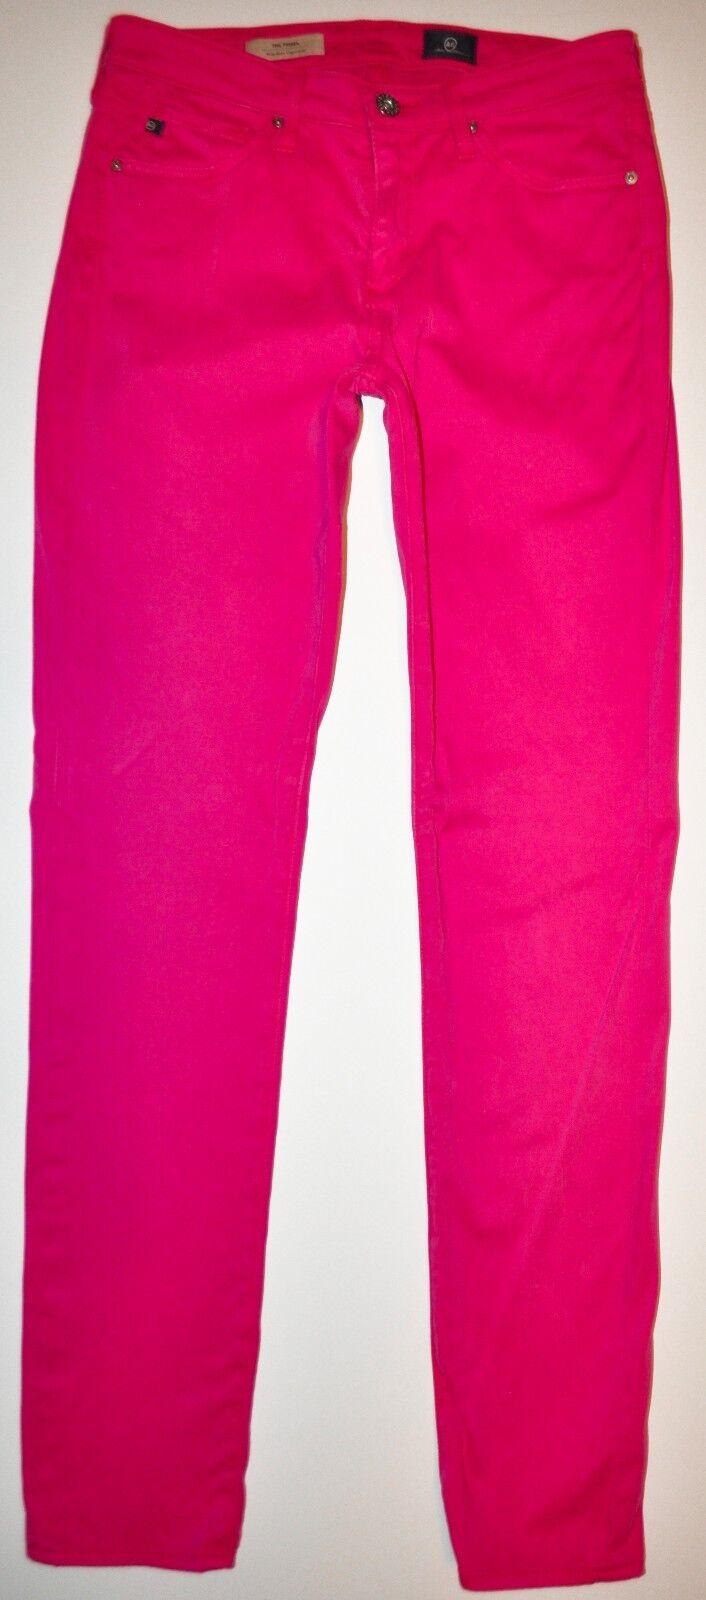 Adriano goldschmied Magenta Prima MidRise Cigarette Jeans Pants 26R X 27 Stretch